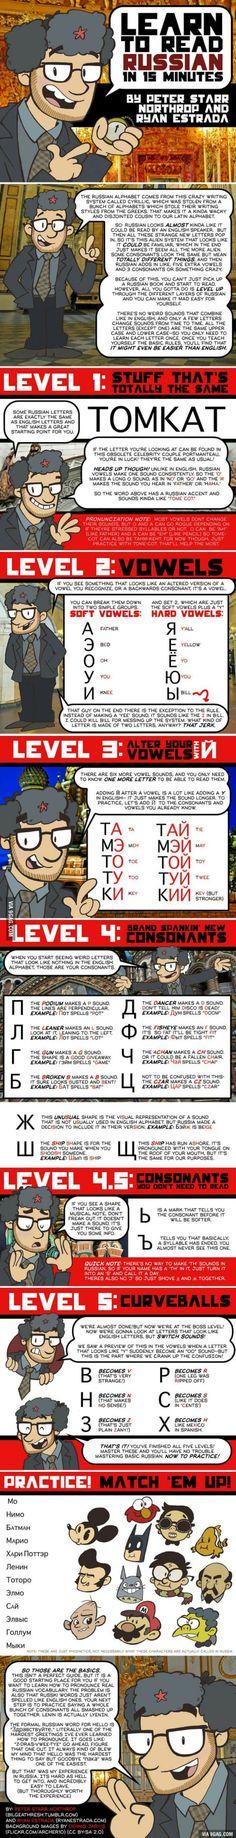 The russian alphabet- explanation